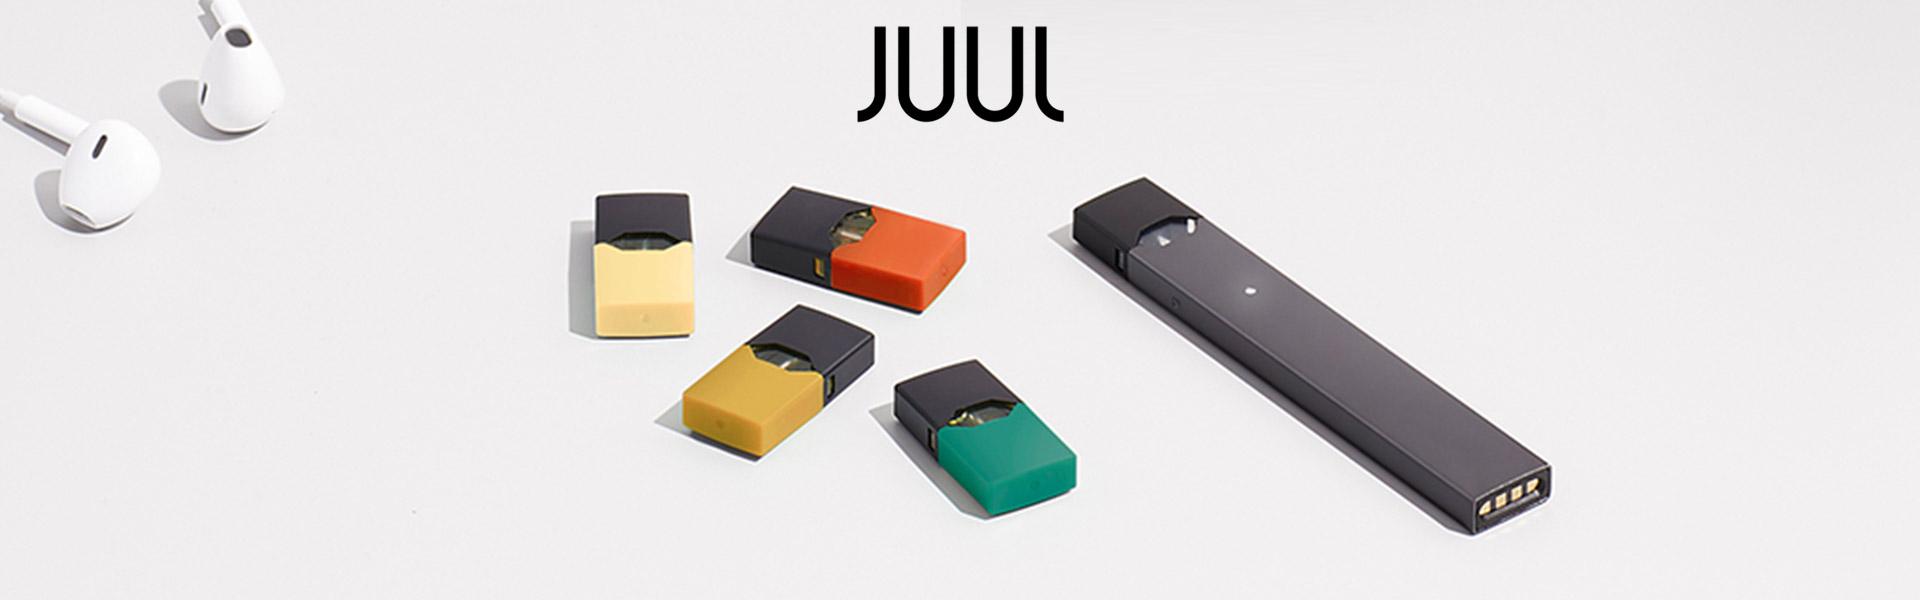 JUUL UK